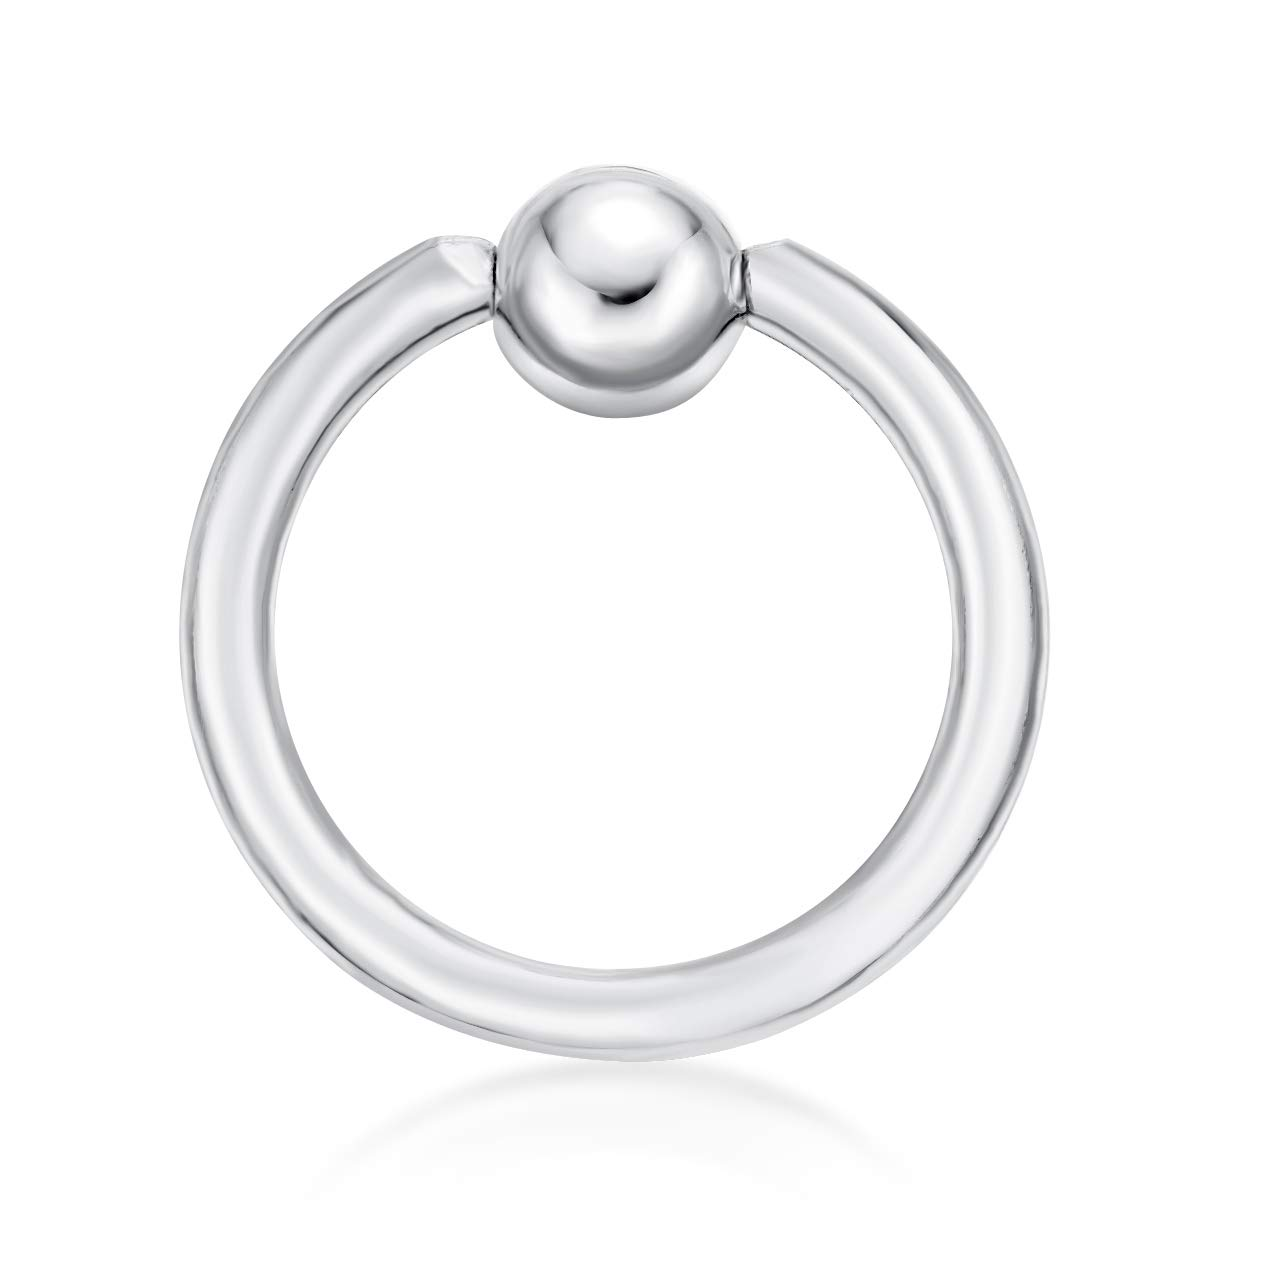 Lavari - 14K White Gold Captive Bead Hoop Lip Eyebrow Cartilage Tragus Nose Ring 16G by Lavari Jewelers